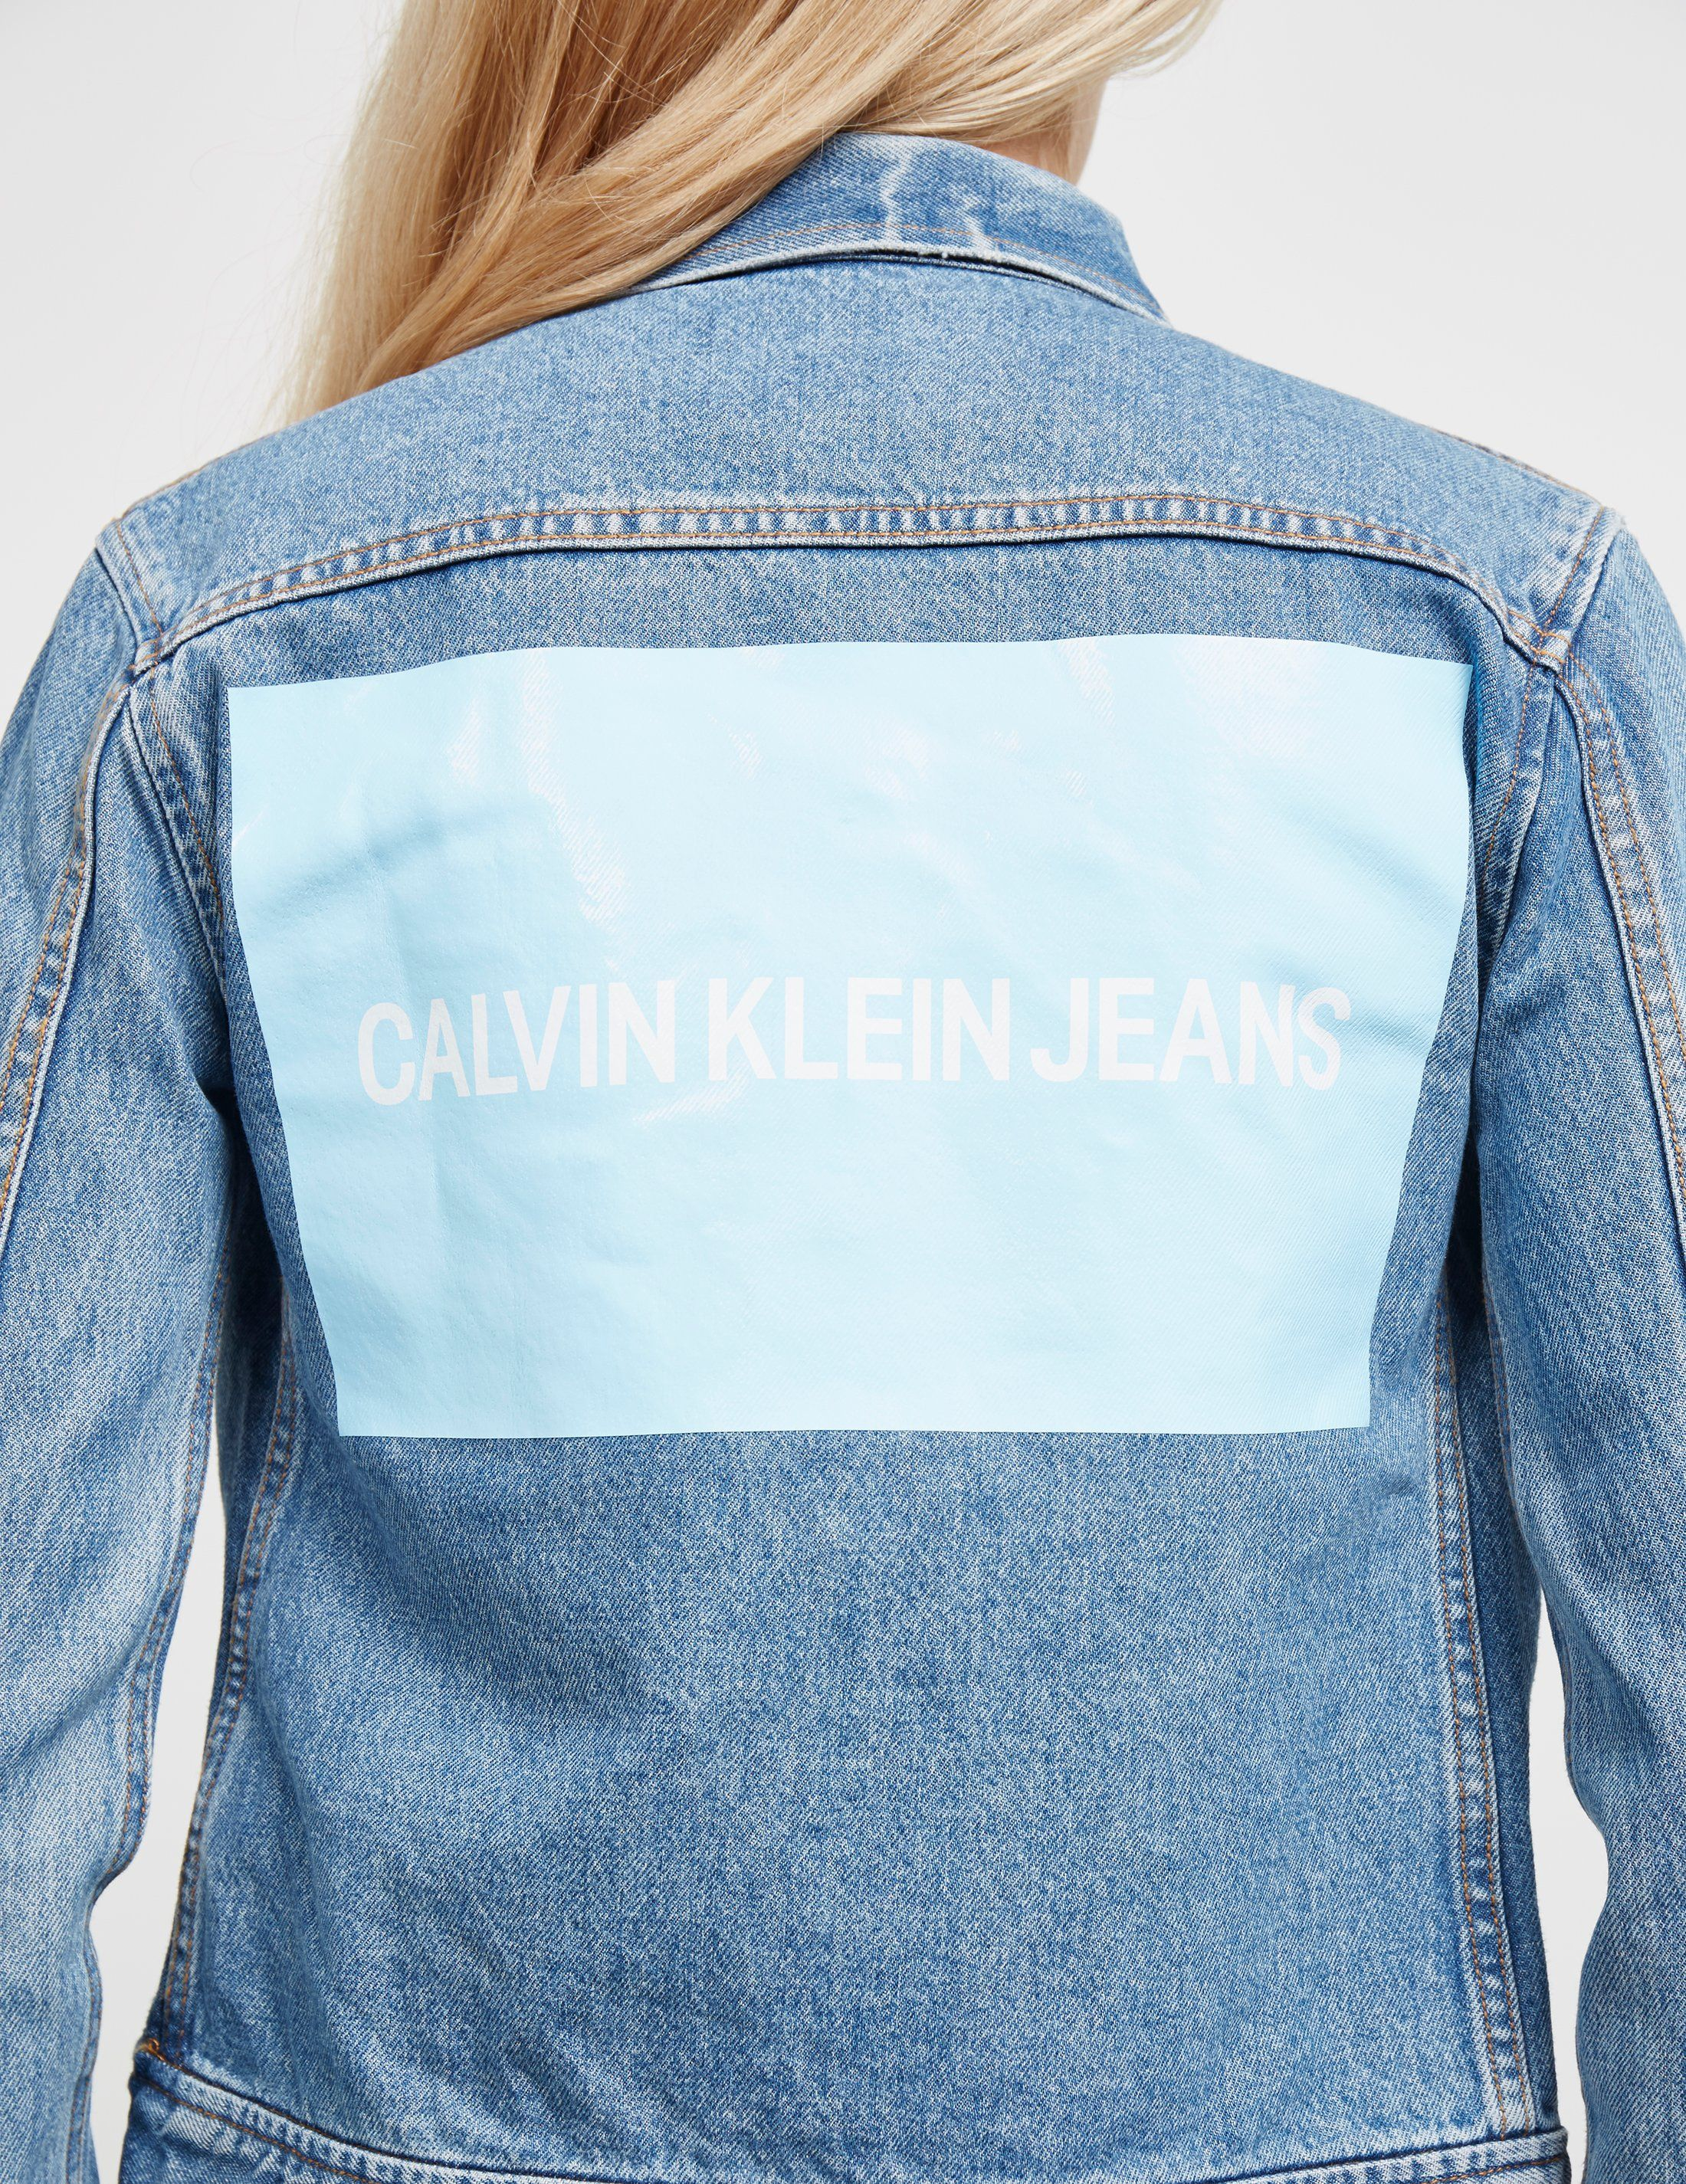 Calvin Klein Jeans Trucker Denim Jacket - Online Exclusive